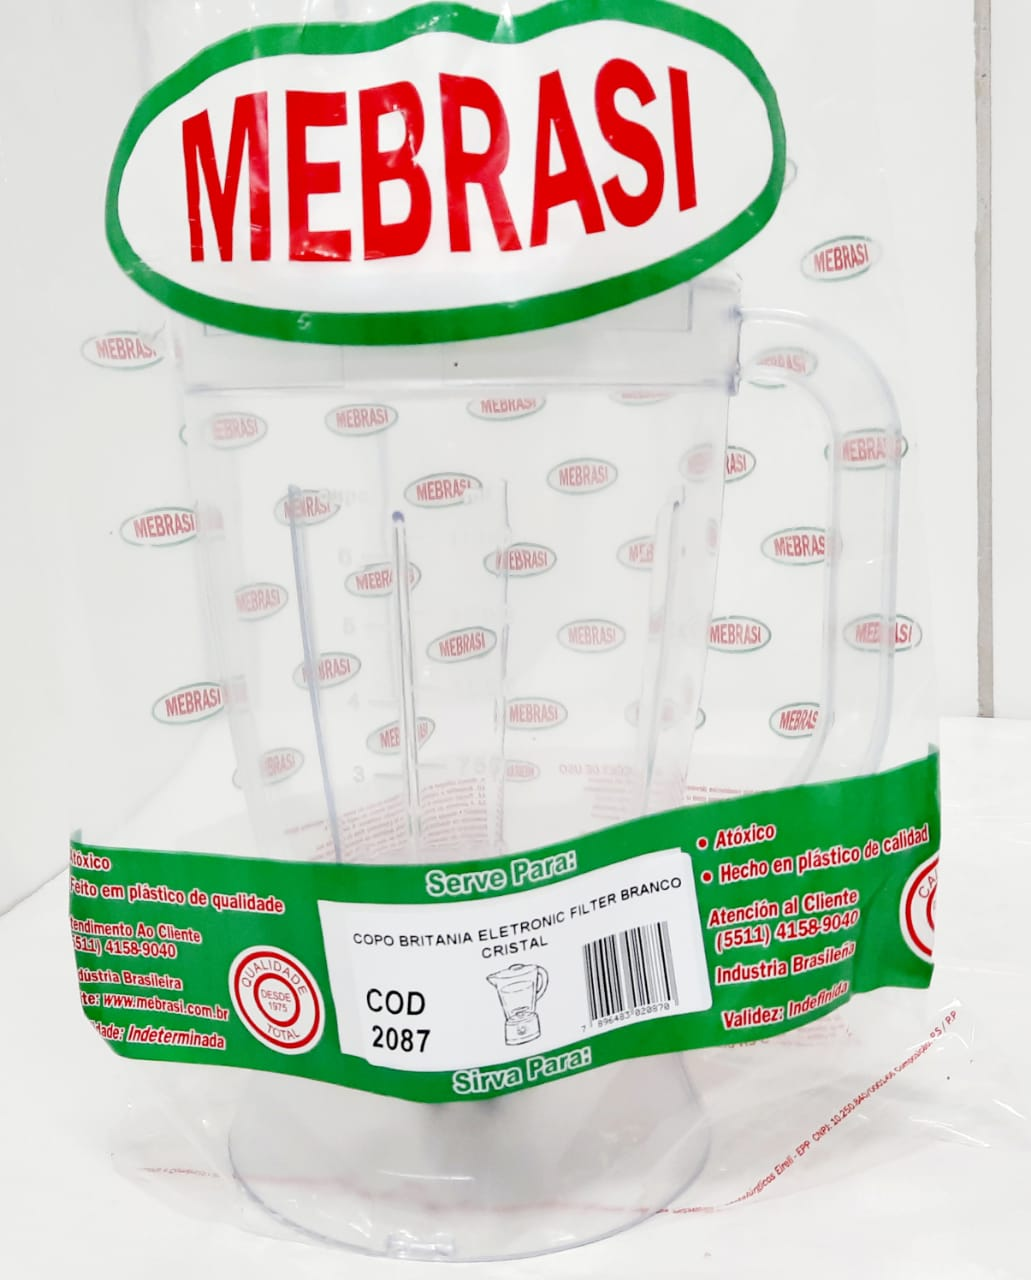 Copo Britânia Cristal ELETR/FILT - Mebrasi